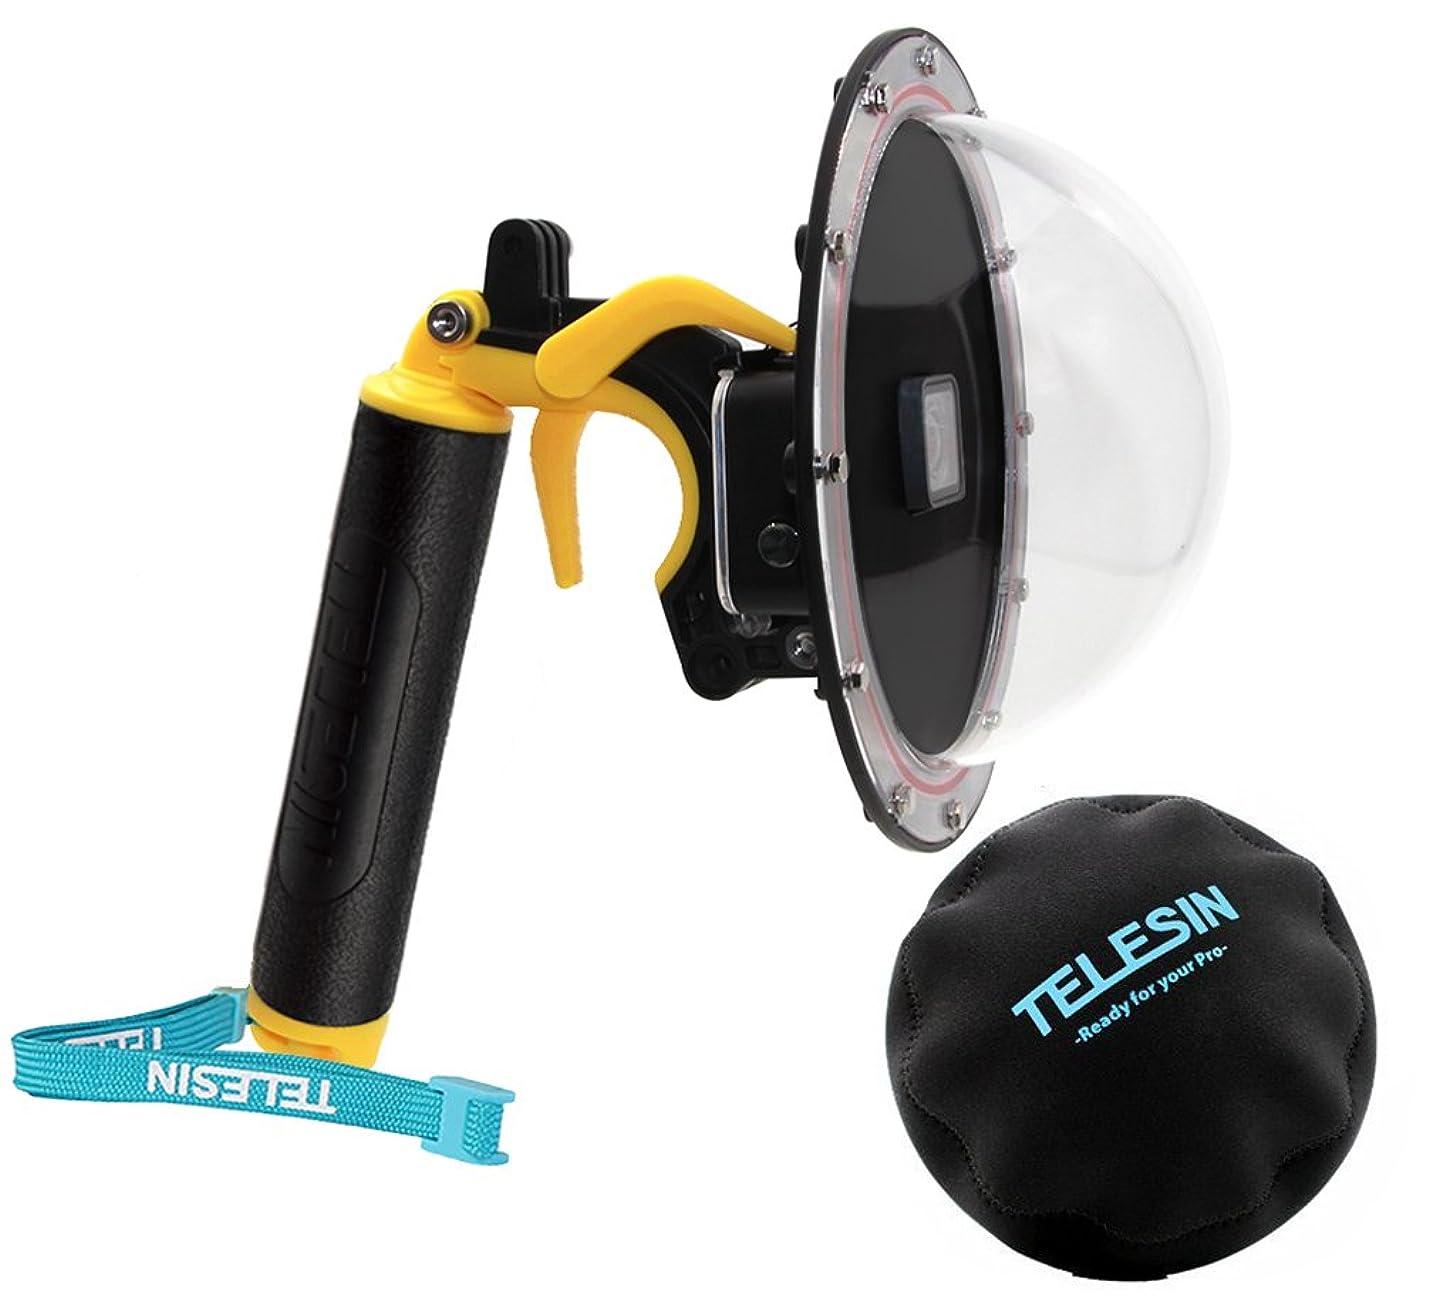 YOEMELY Dome GoPro Hero 7 Black Hero 2018 Hero 5 Hero 6 Underwater Dome Port GoPro Cover 6 inch with Gopro 7 Case Waterproof and Floating Grip dkakmmfgm